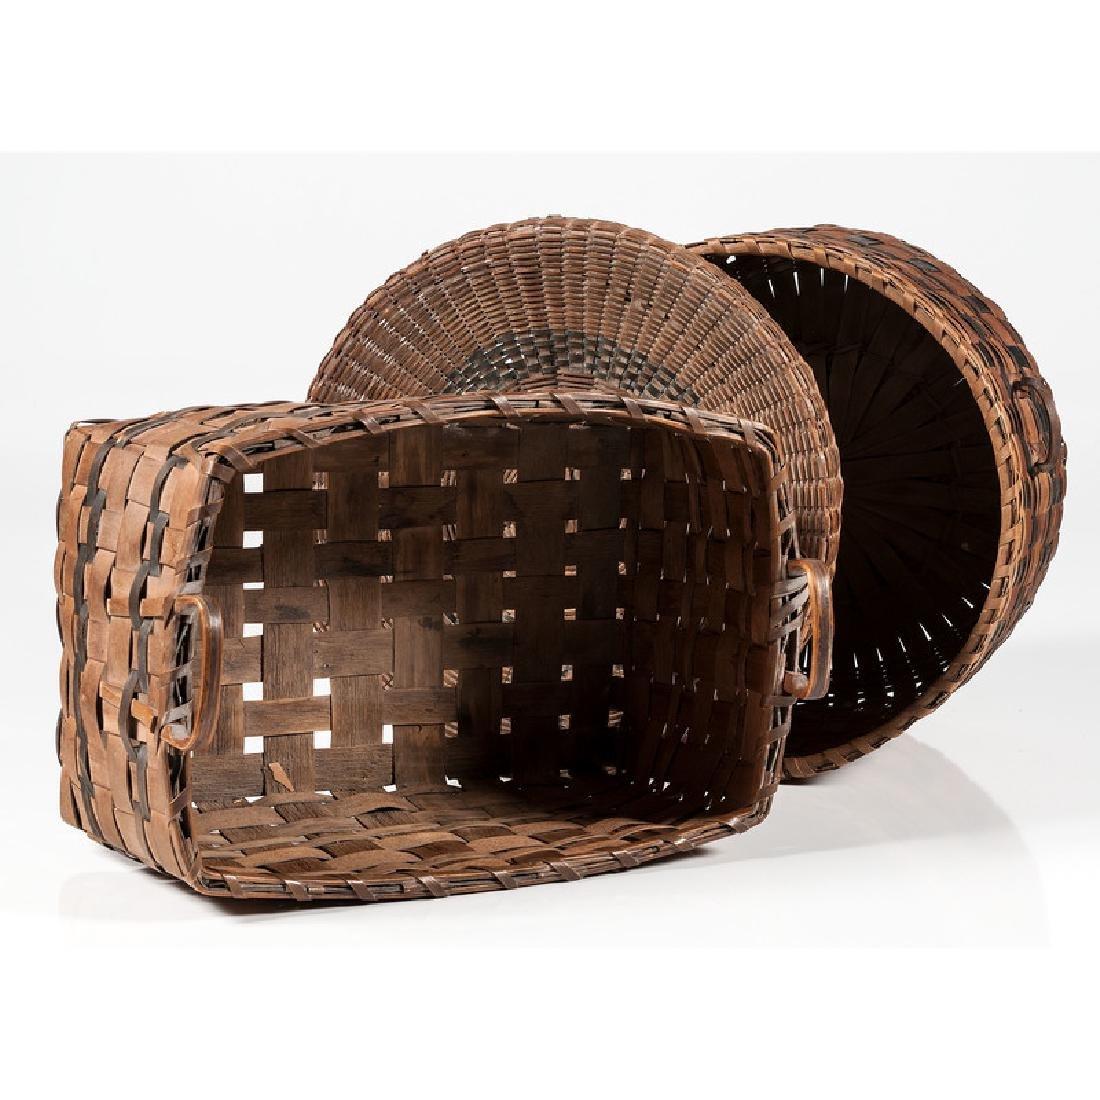 Polychrome Woven Baskets - 2